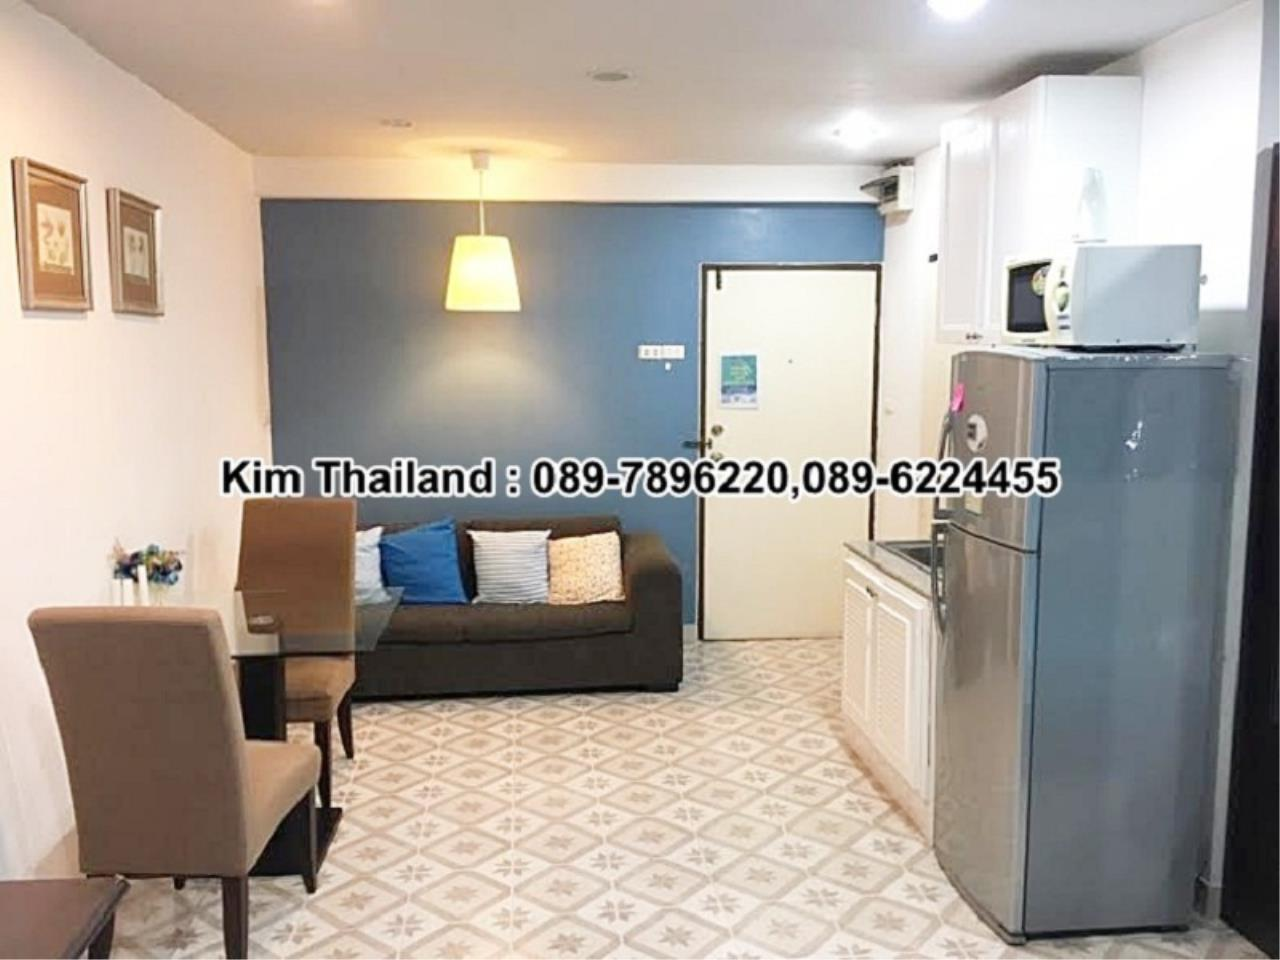 BKKcondorental Agency's For rent, Condo Saranjai Mansion. Area 35 sq.m. Studio. Rent 16,000baht/month 6